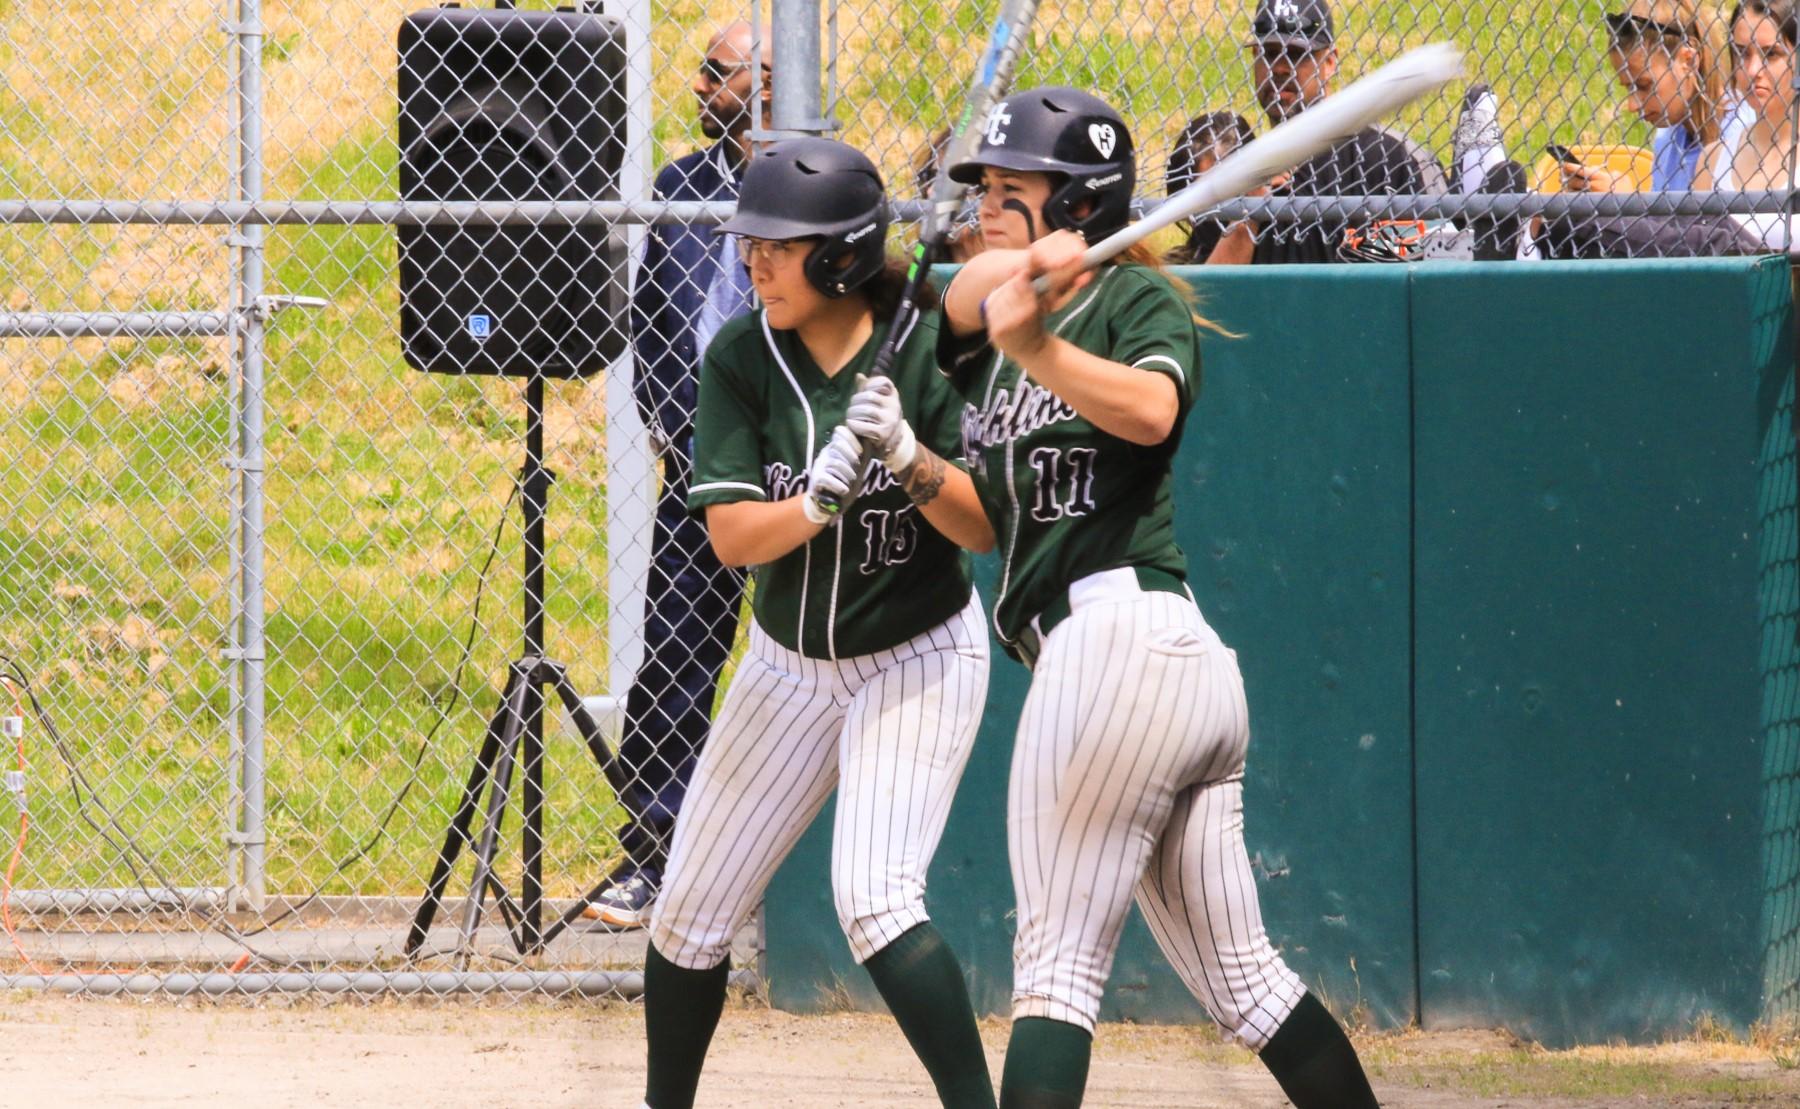 Women's Softball Action Photo